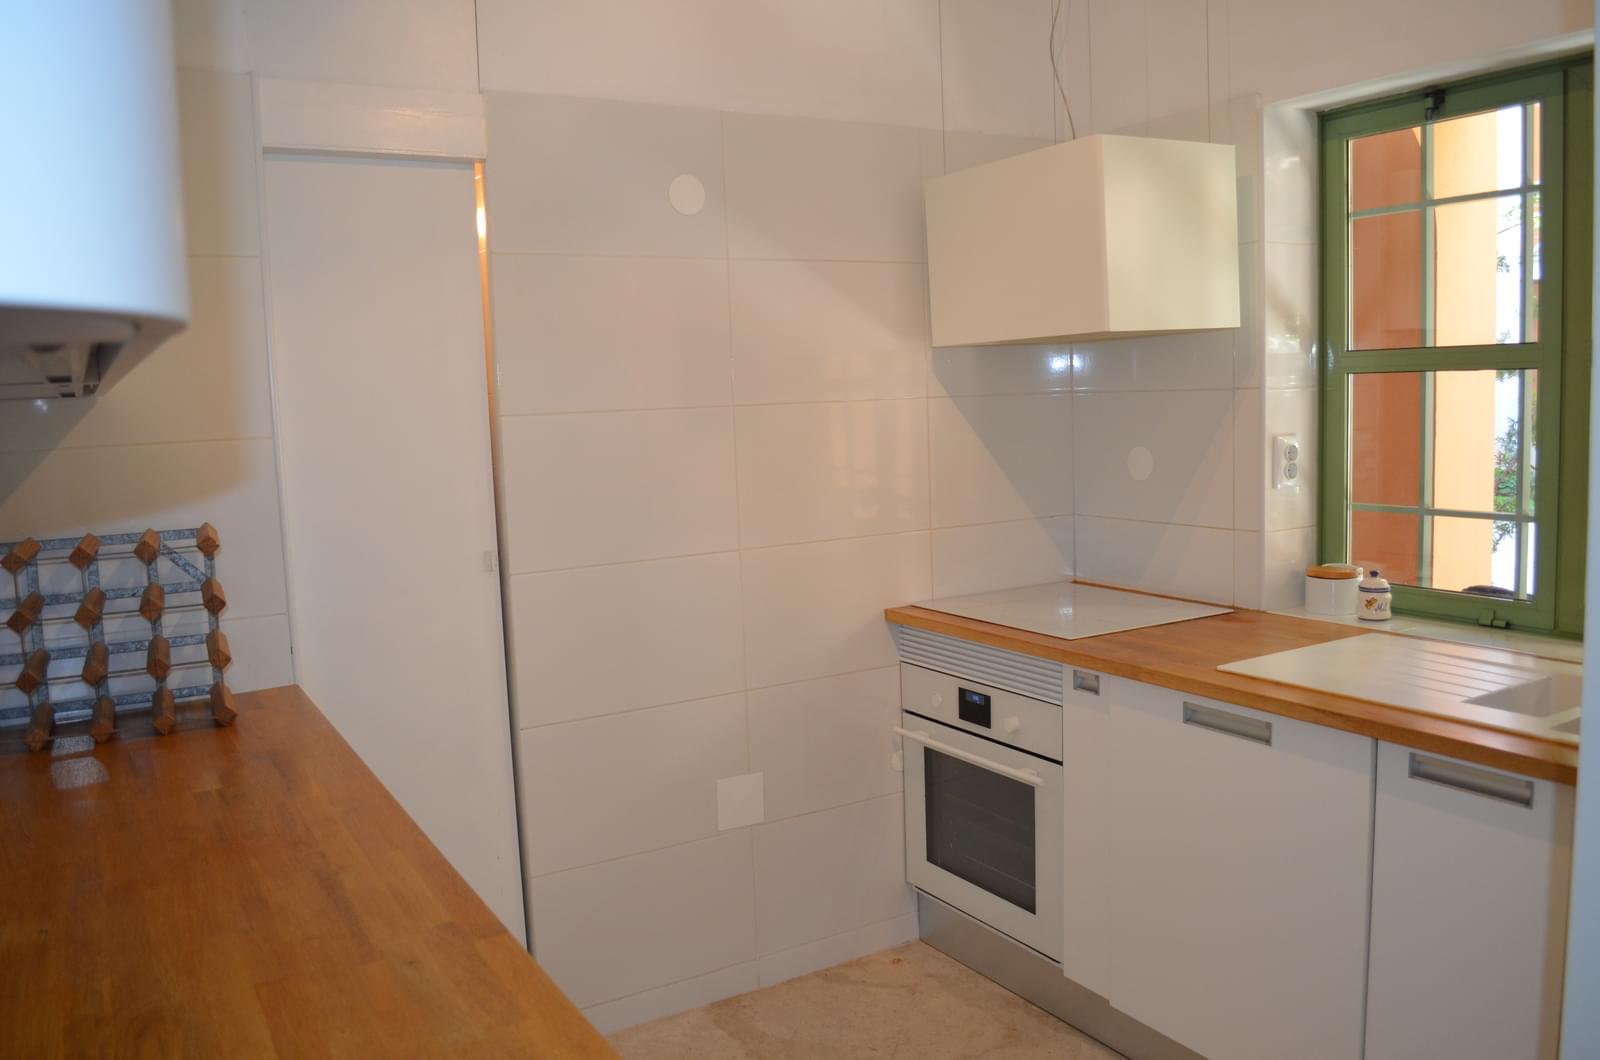 pf17565-apartamento-t3-lisboa-60d2c798-9f7b-453e-9c9e-0717d03781eb